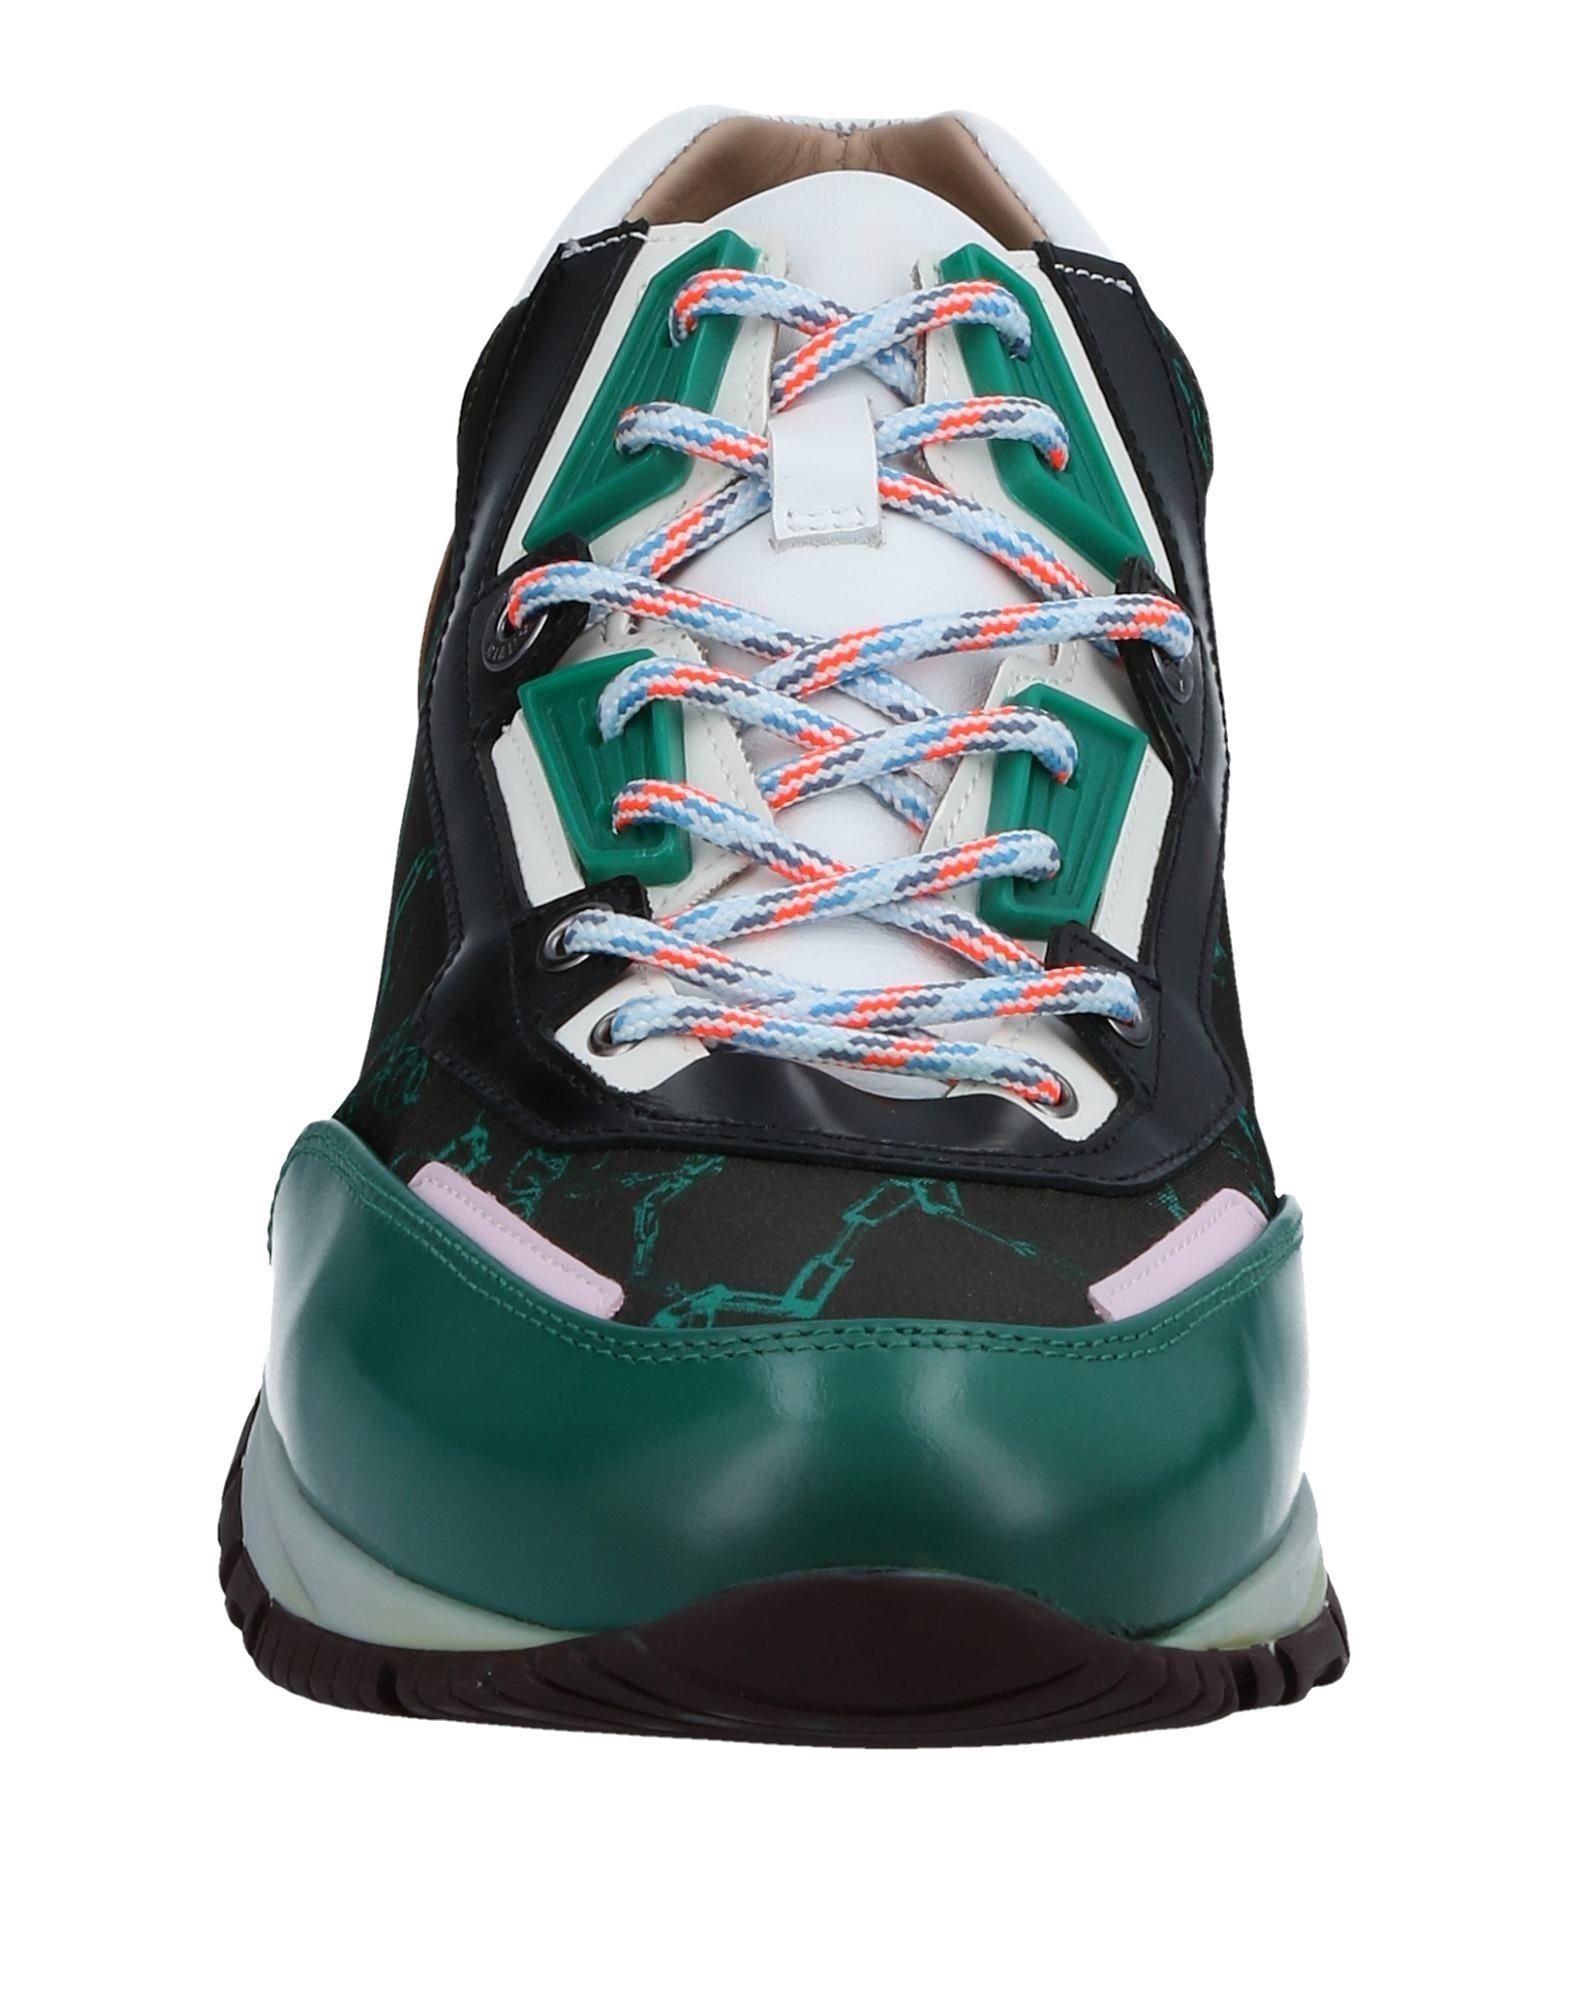 Lanvin Sneakers Herren  11505747GF Gute Qualität beliebte Schuhe